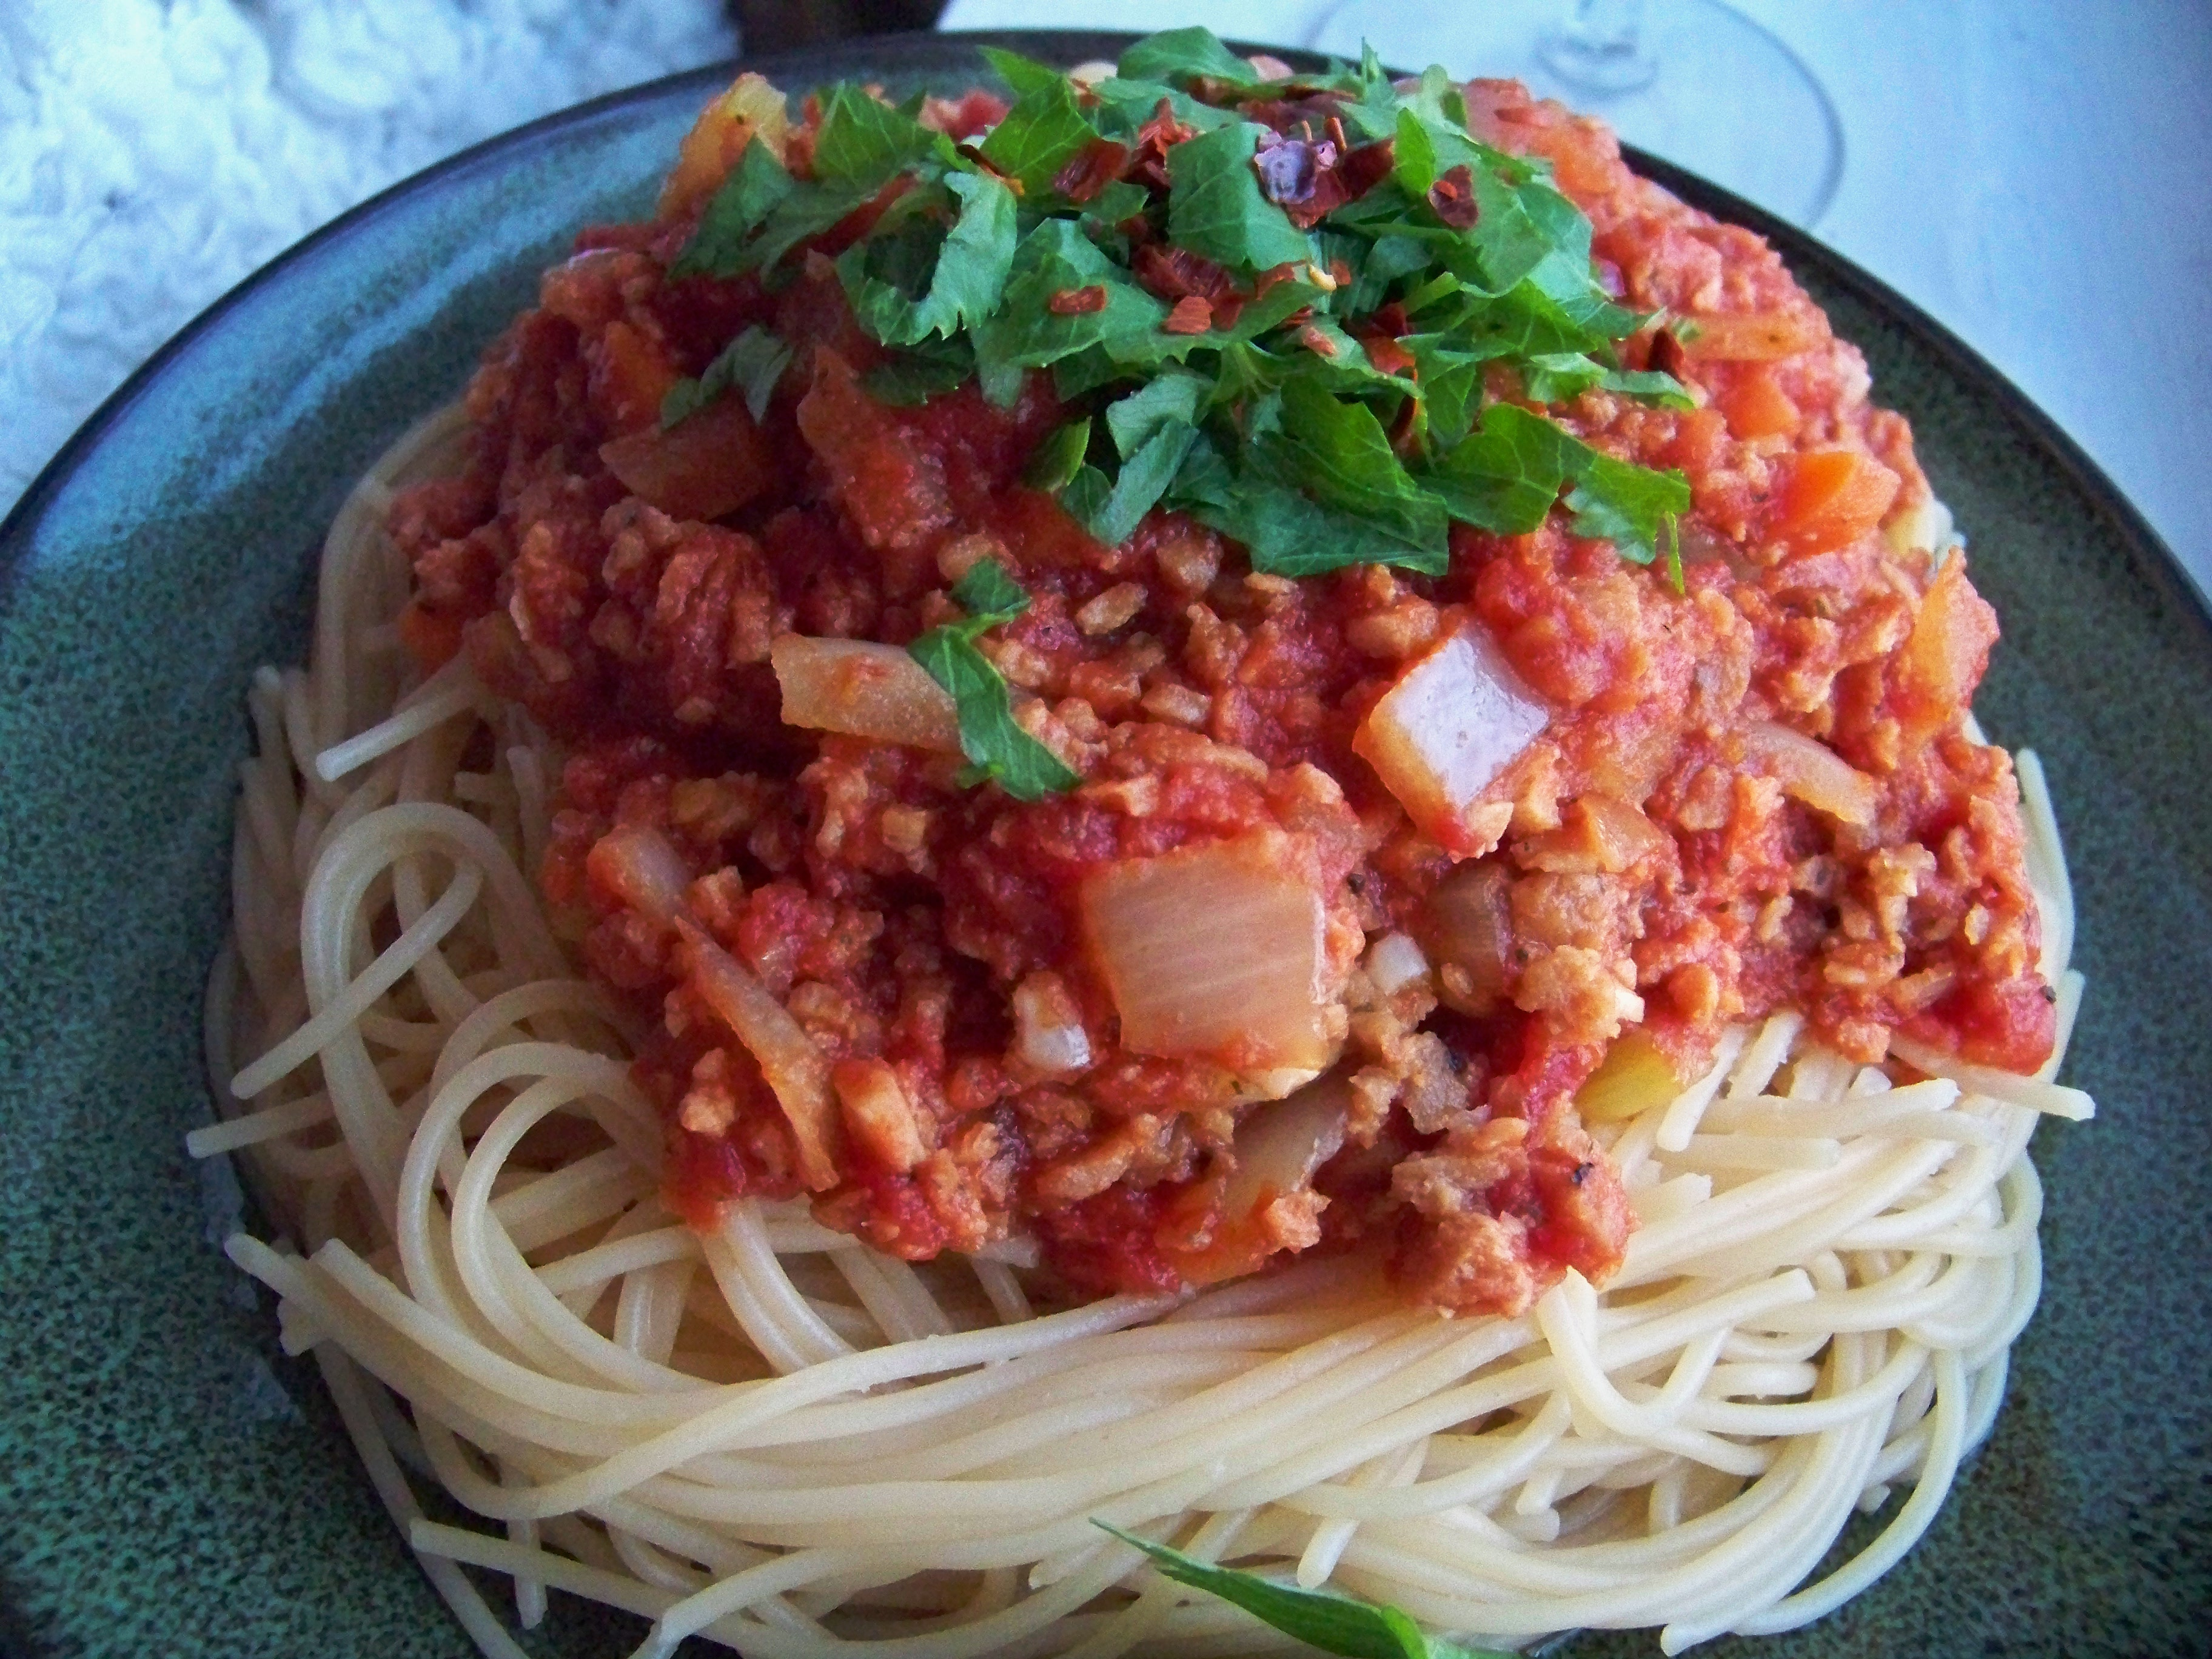 how to cook tvp spaghetti sauce